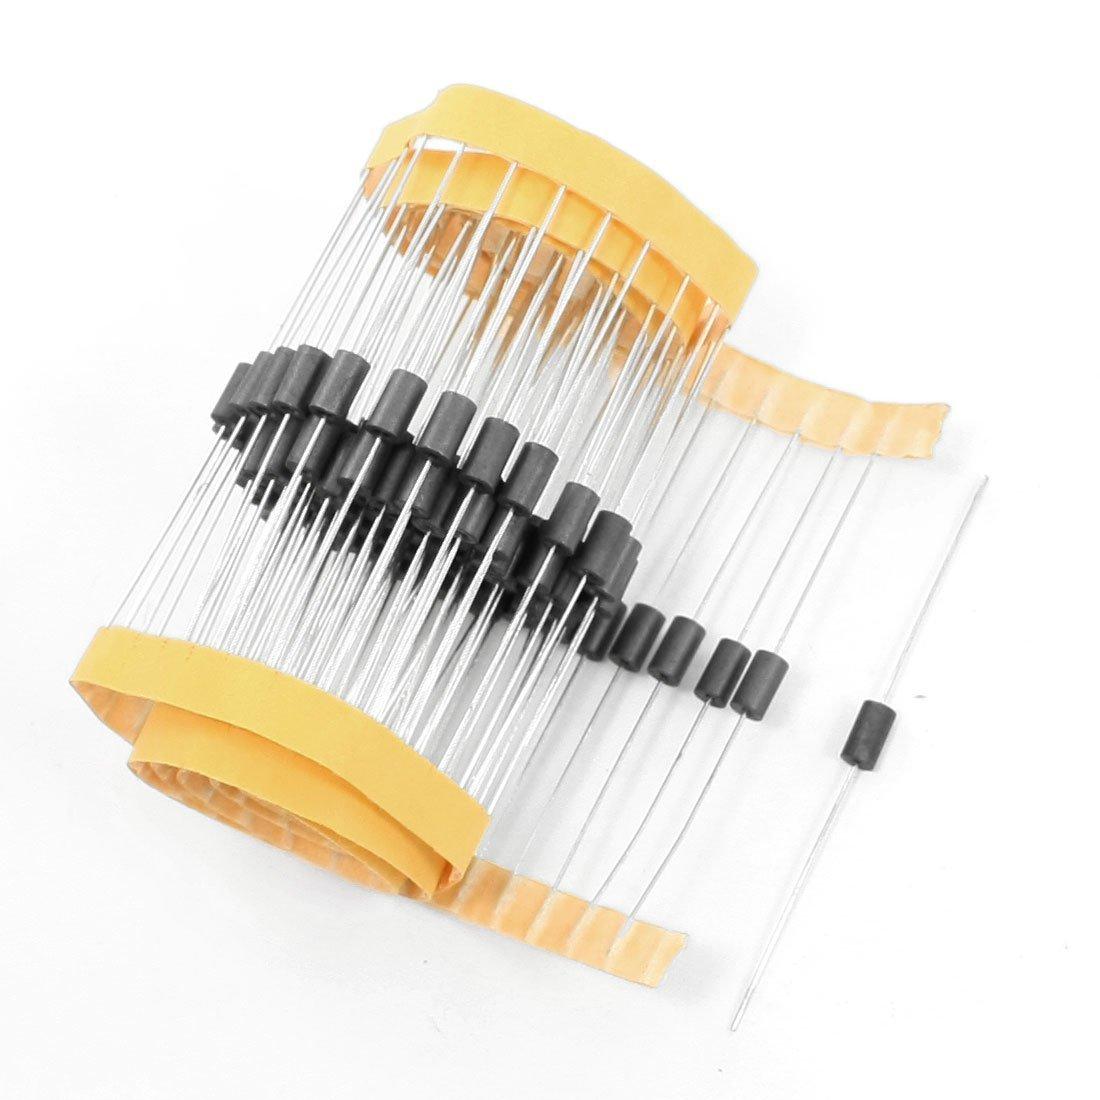 3.5mm x 6mm x 0.8mm Axial Lead Ferrite Beads Inductors 100 Pcs Sourcingmap a13062800ux1033